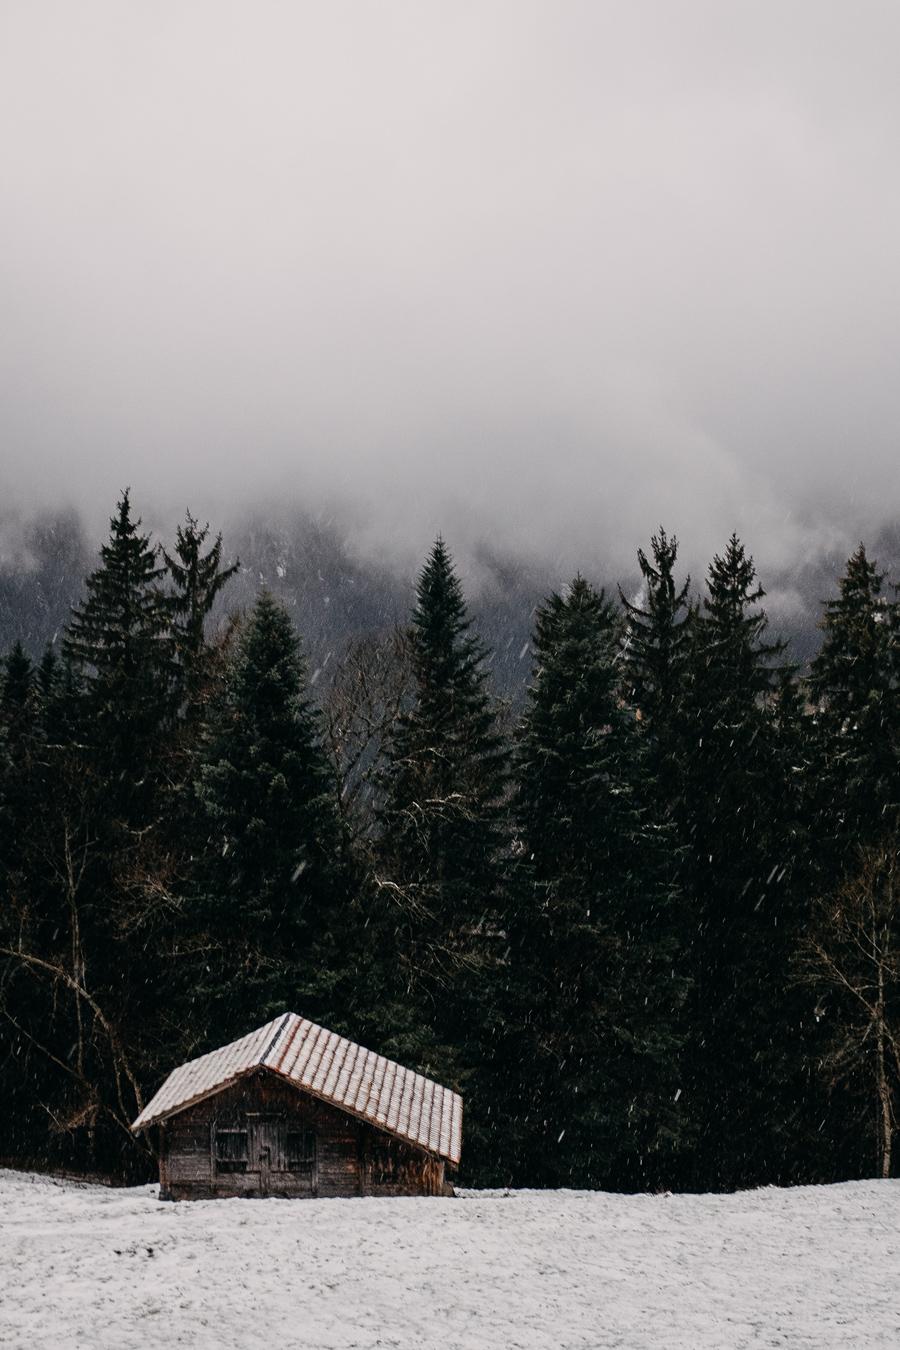 048-switzerland-mountains-snow-travel-photography.jpg